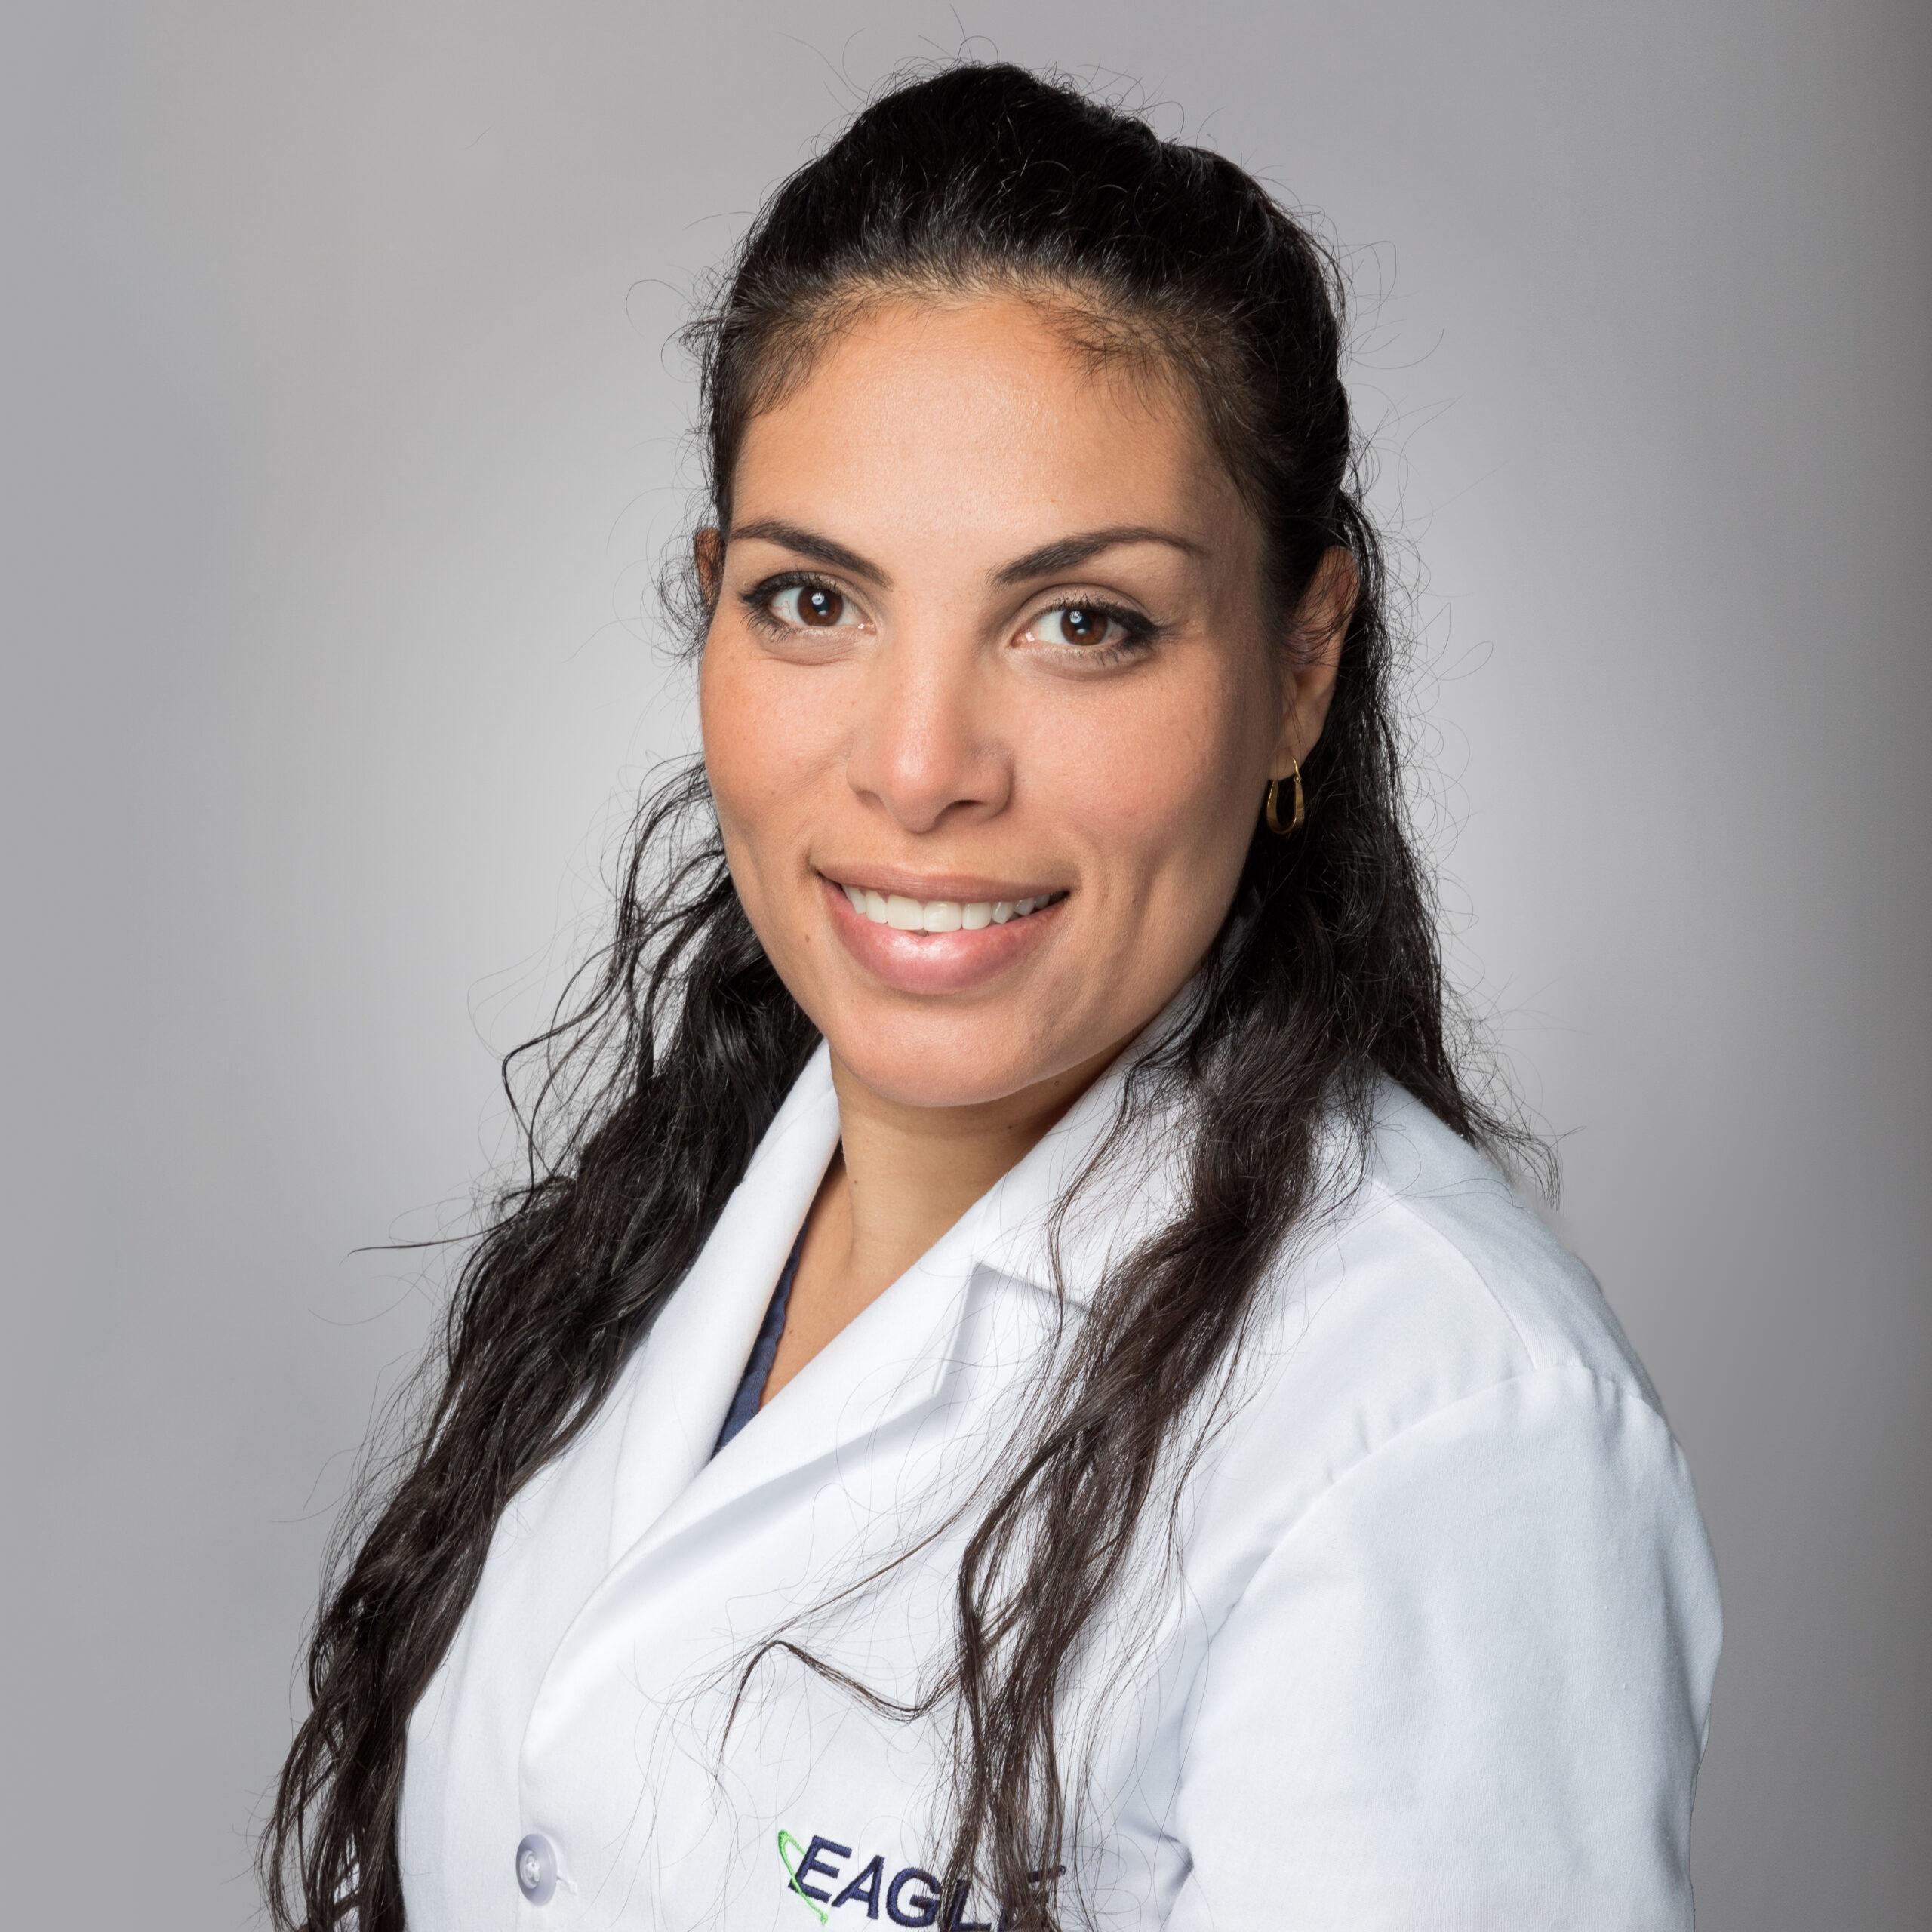 Margaret Pereira, MS